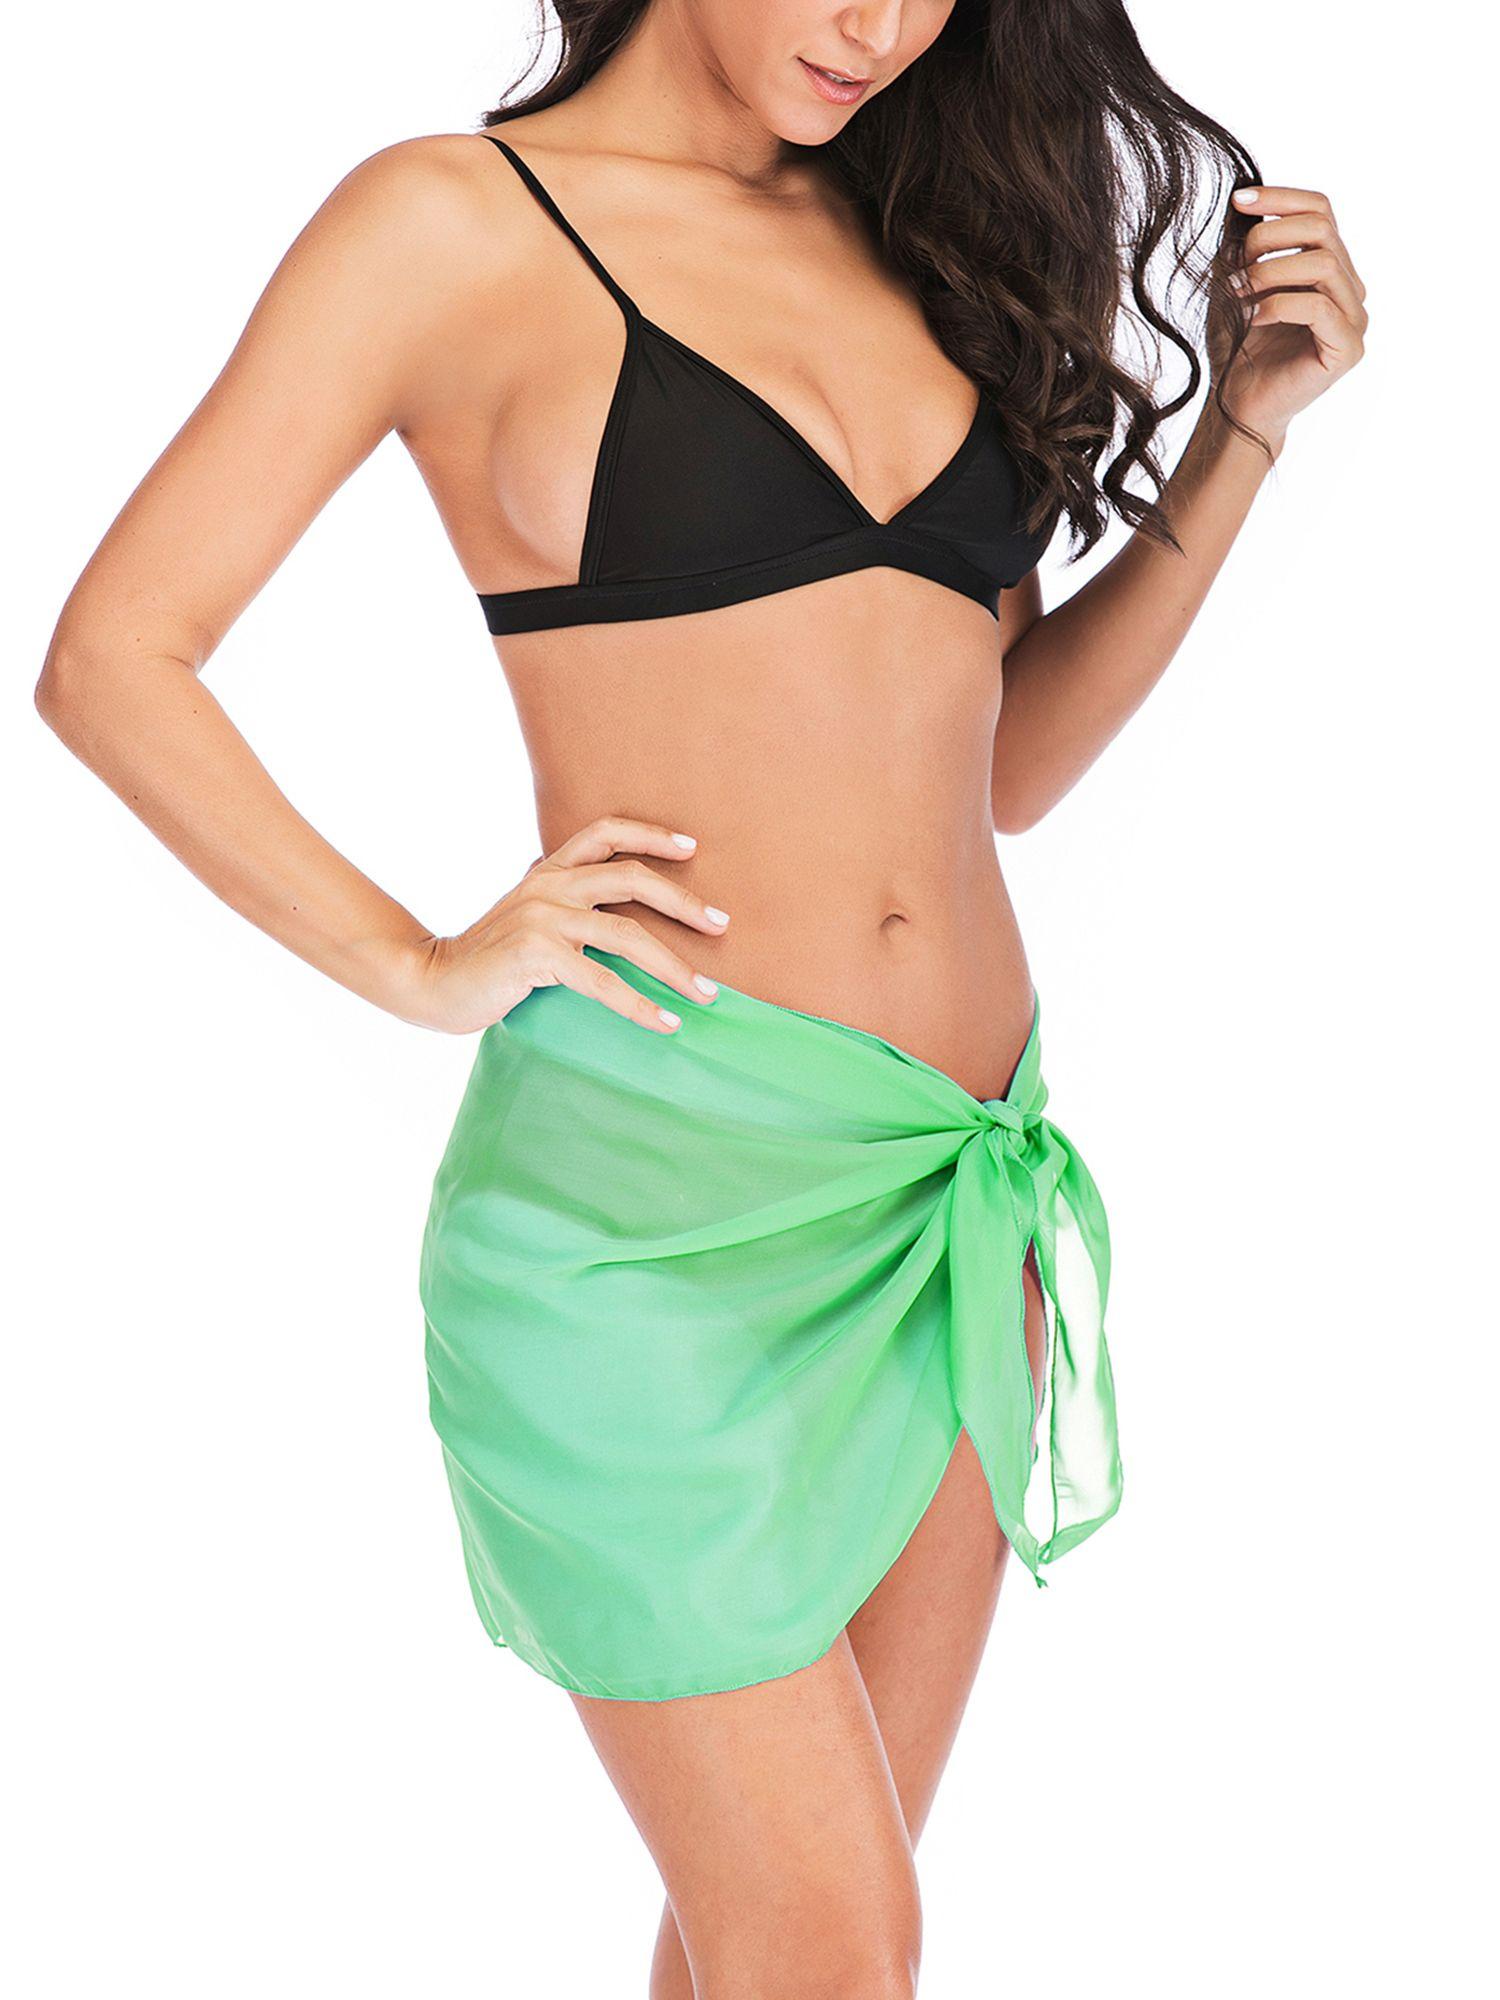 296726cb8dc7d SAYFUT Women s Ice Silk Sexy Spaghetti Strap Backless Beach Dress Swimsuit  Cover Up Bikini Wrap Beachwear